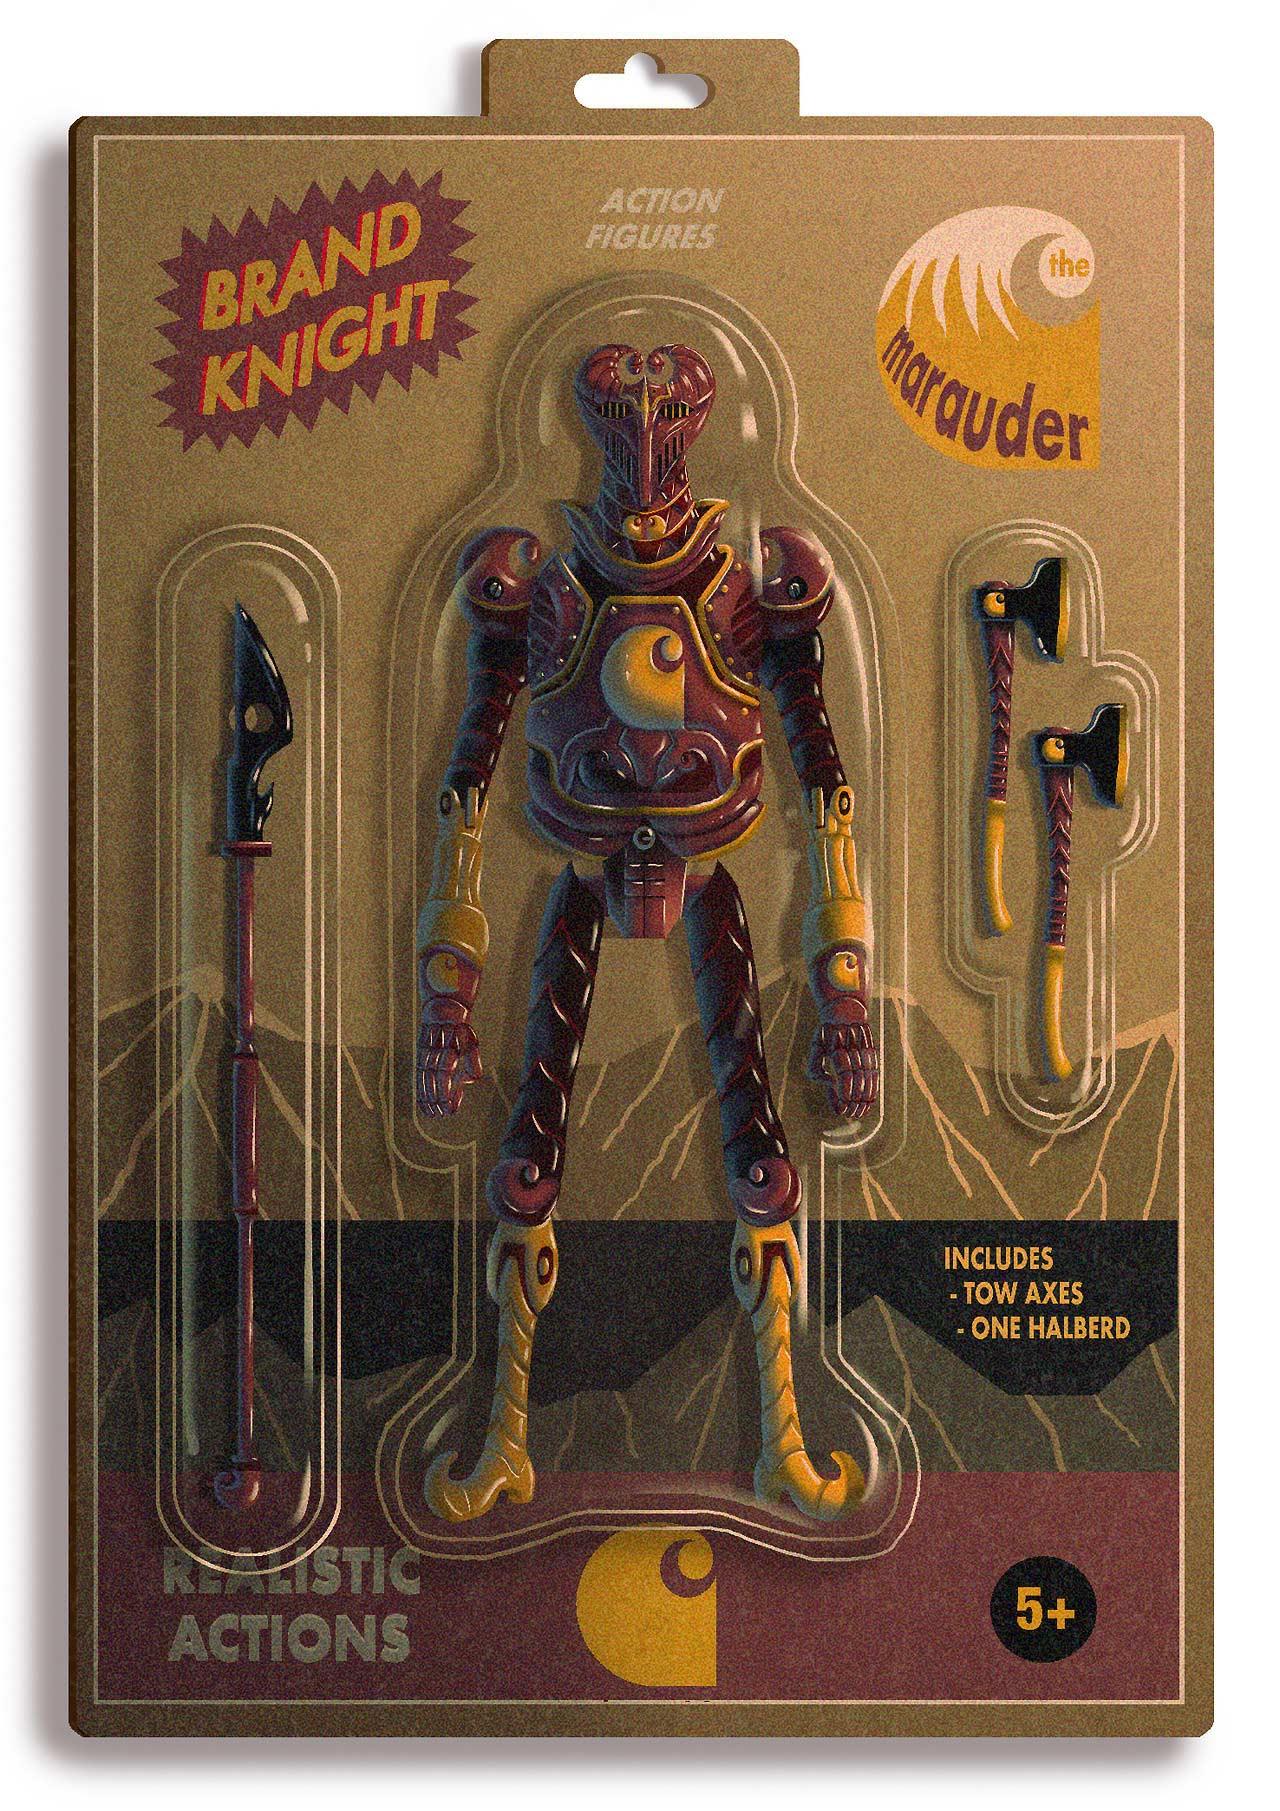 Brand Knights brand-knights_04